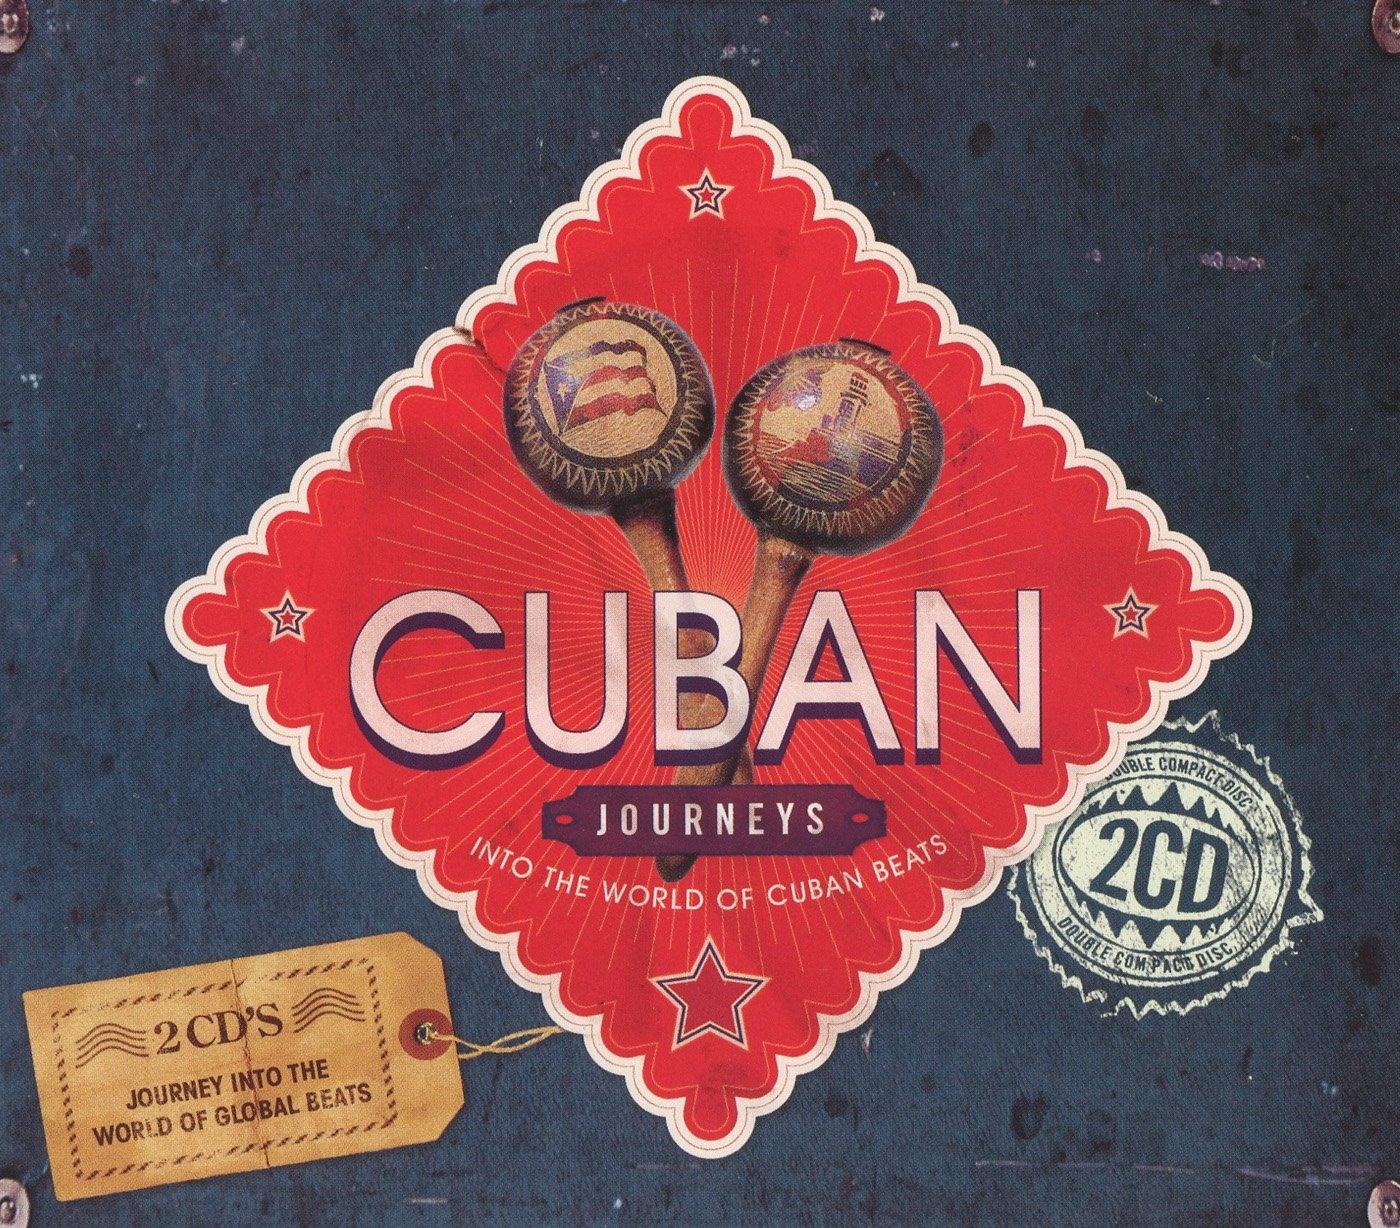 Cuban Journeys